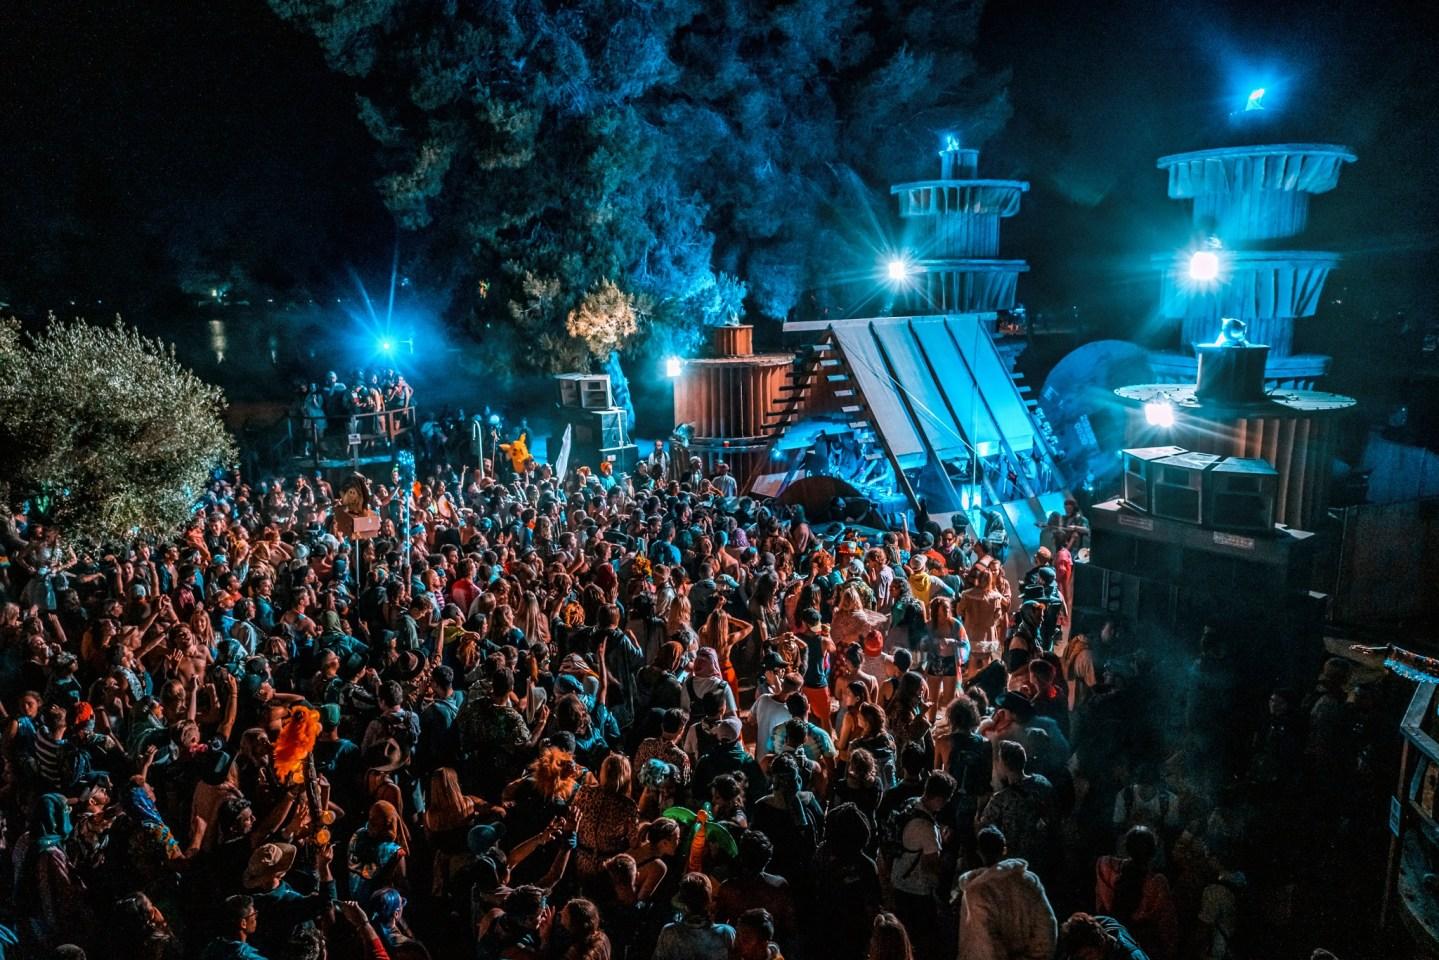 LiB stage crowd at night